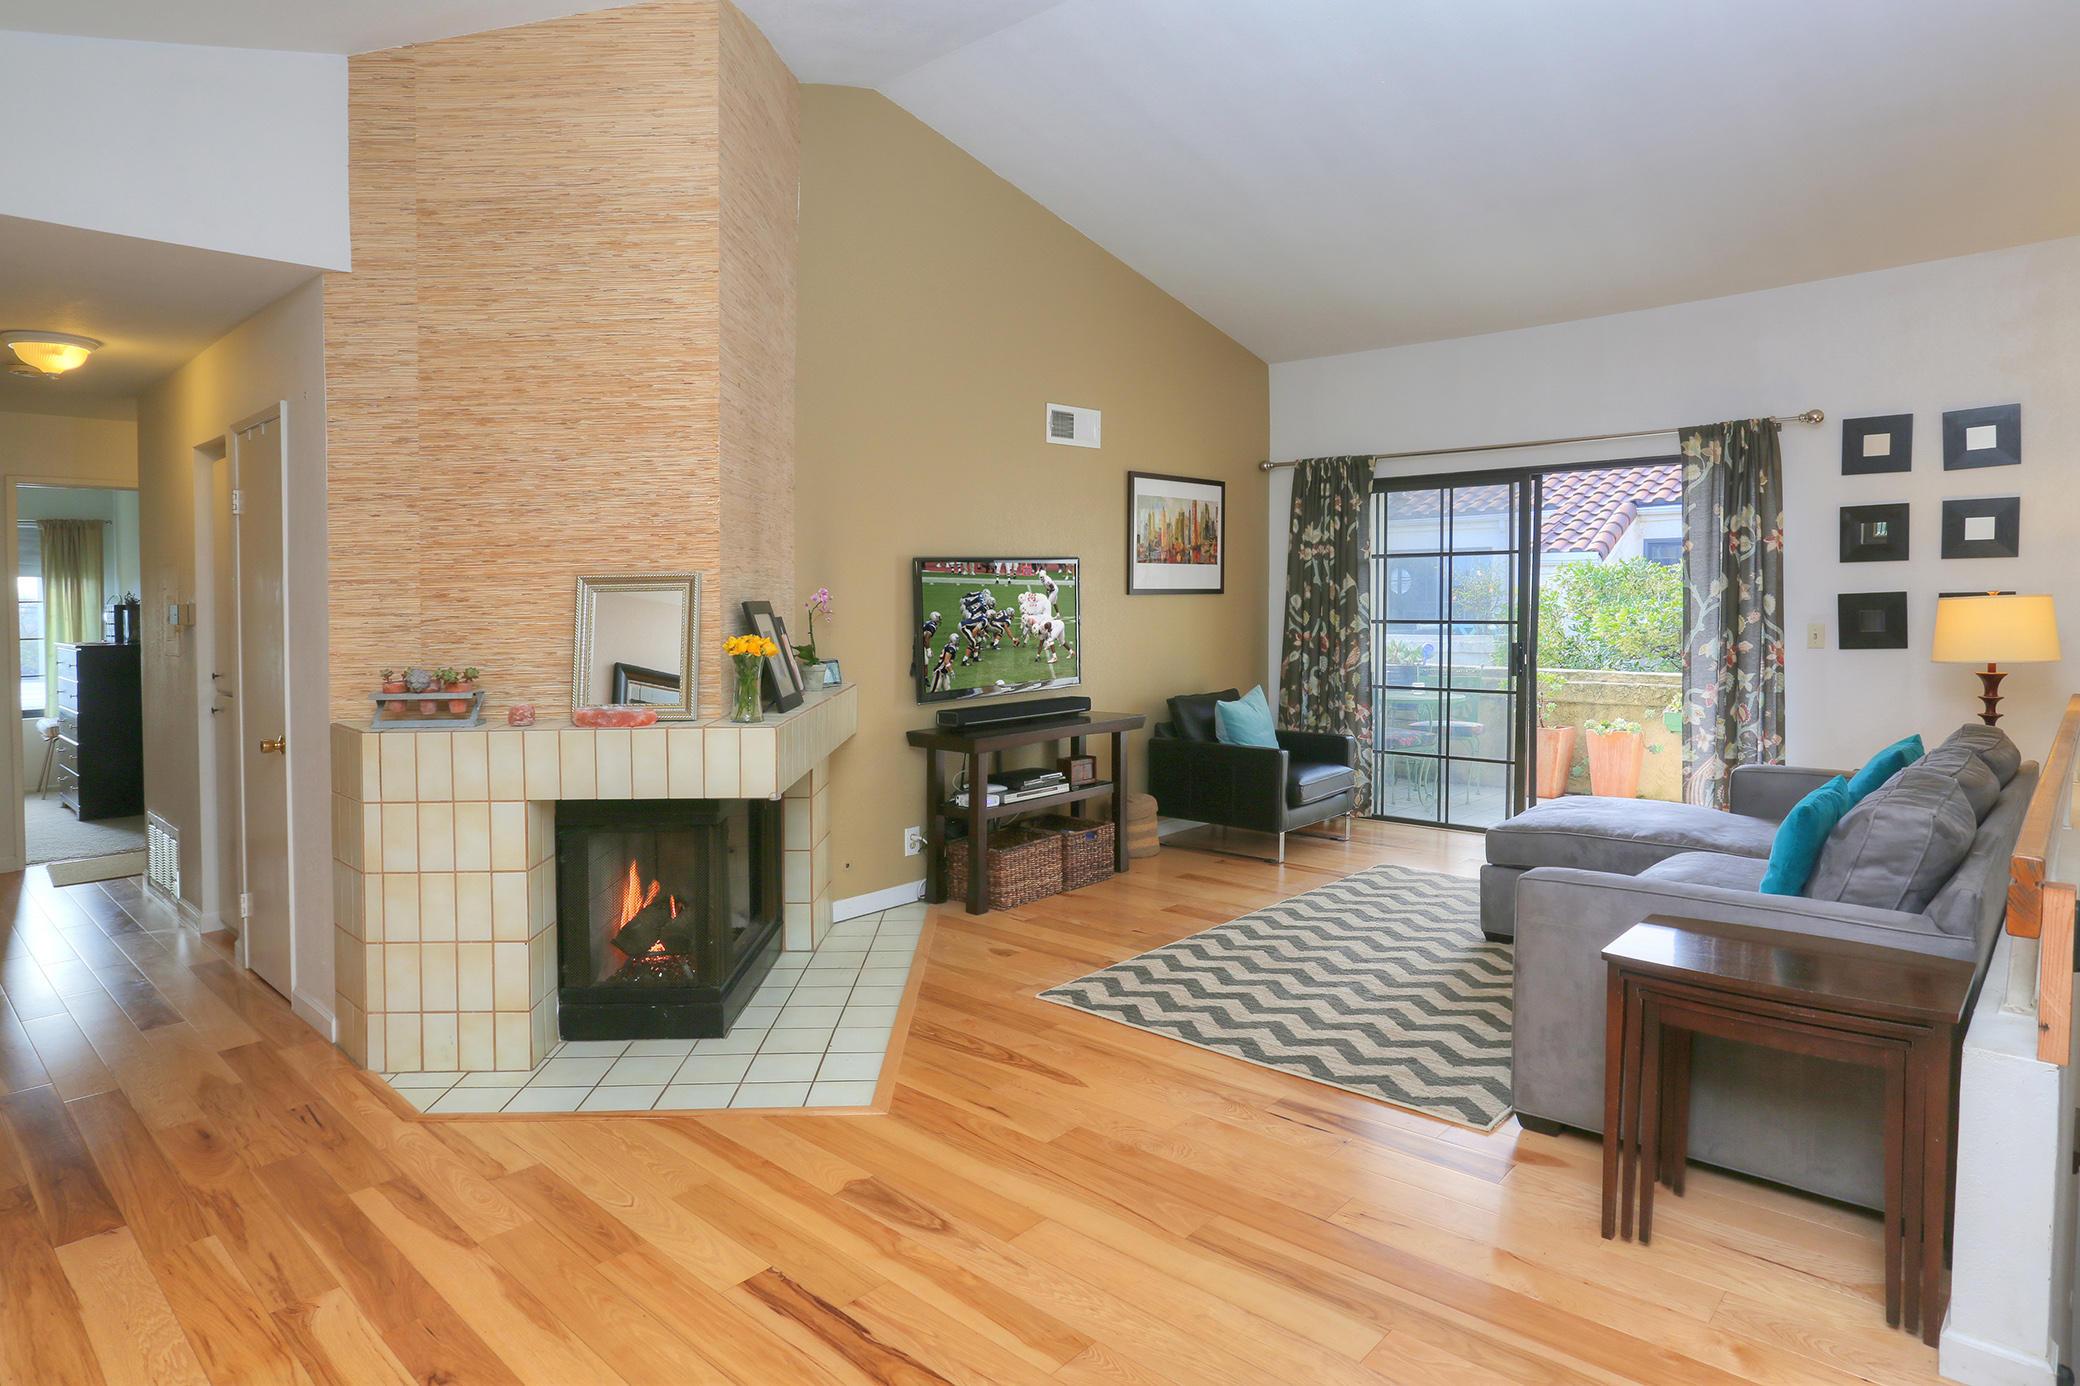 Property photo for 1230 Franciscan Ct #4 Carpinteria, California 93013 - 17-247